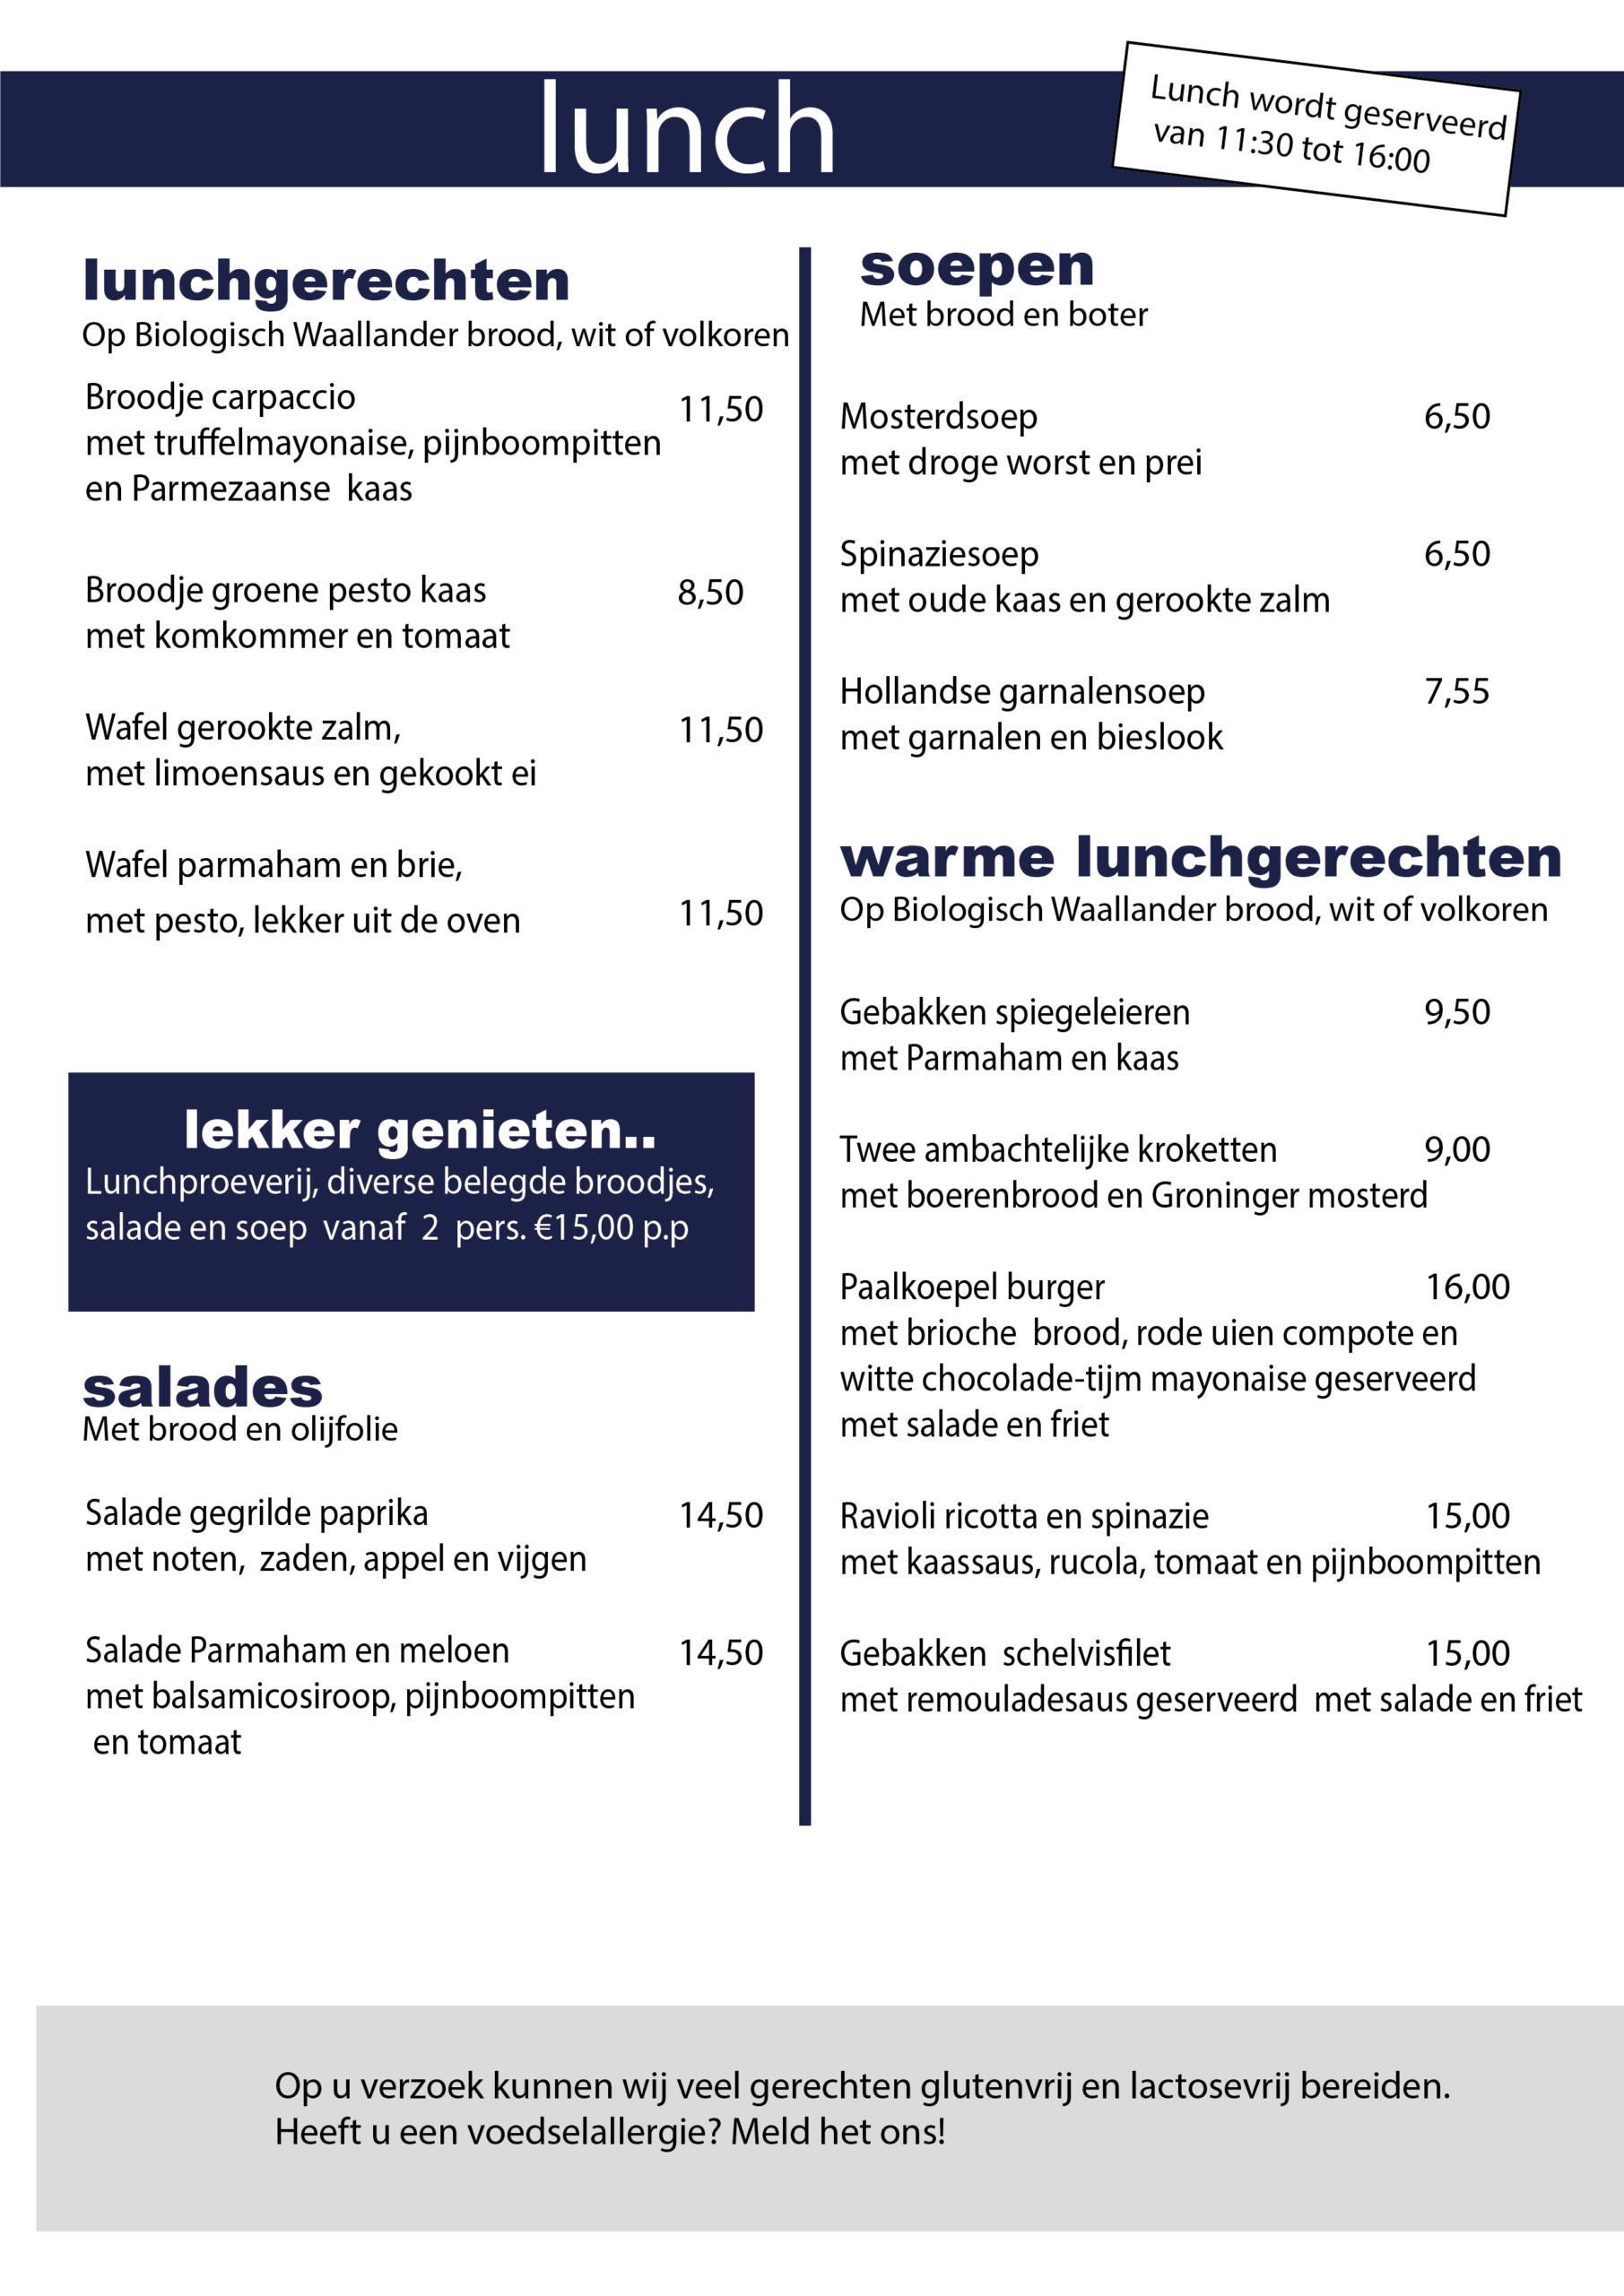 lunch menukaart